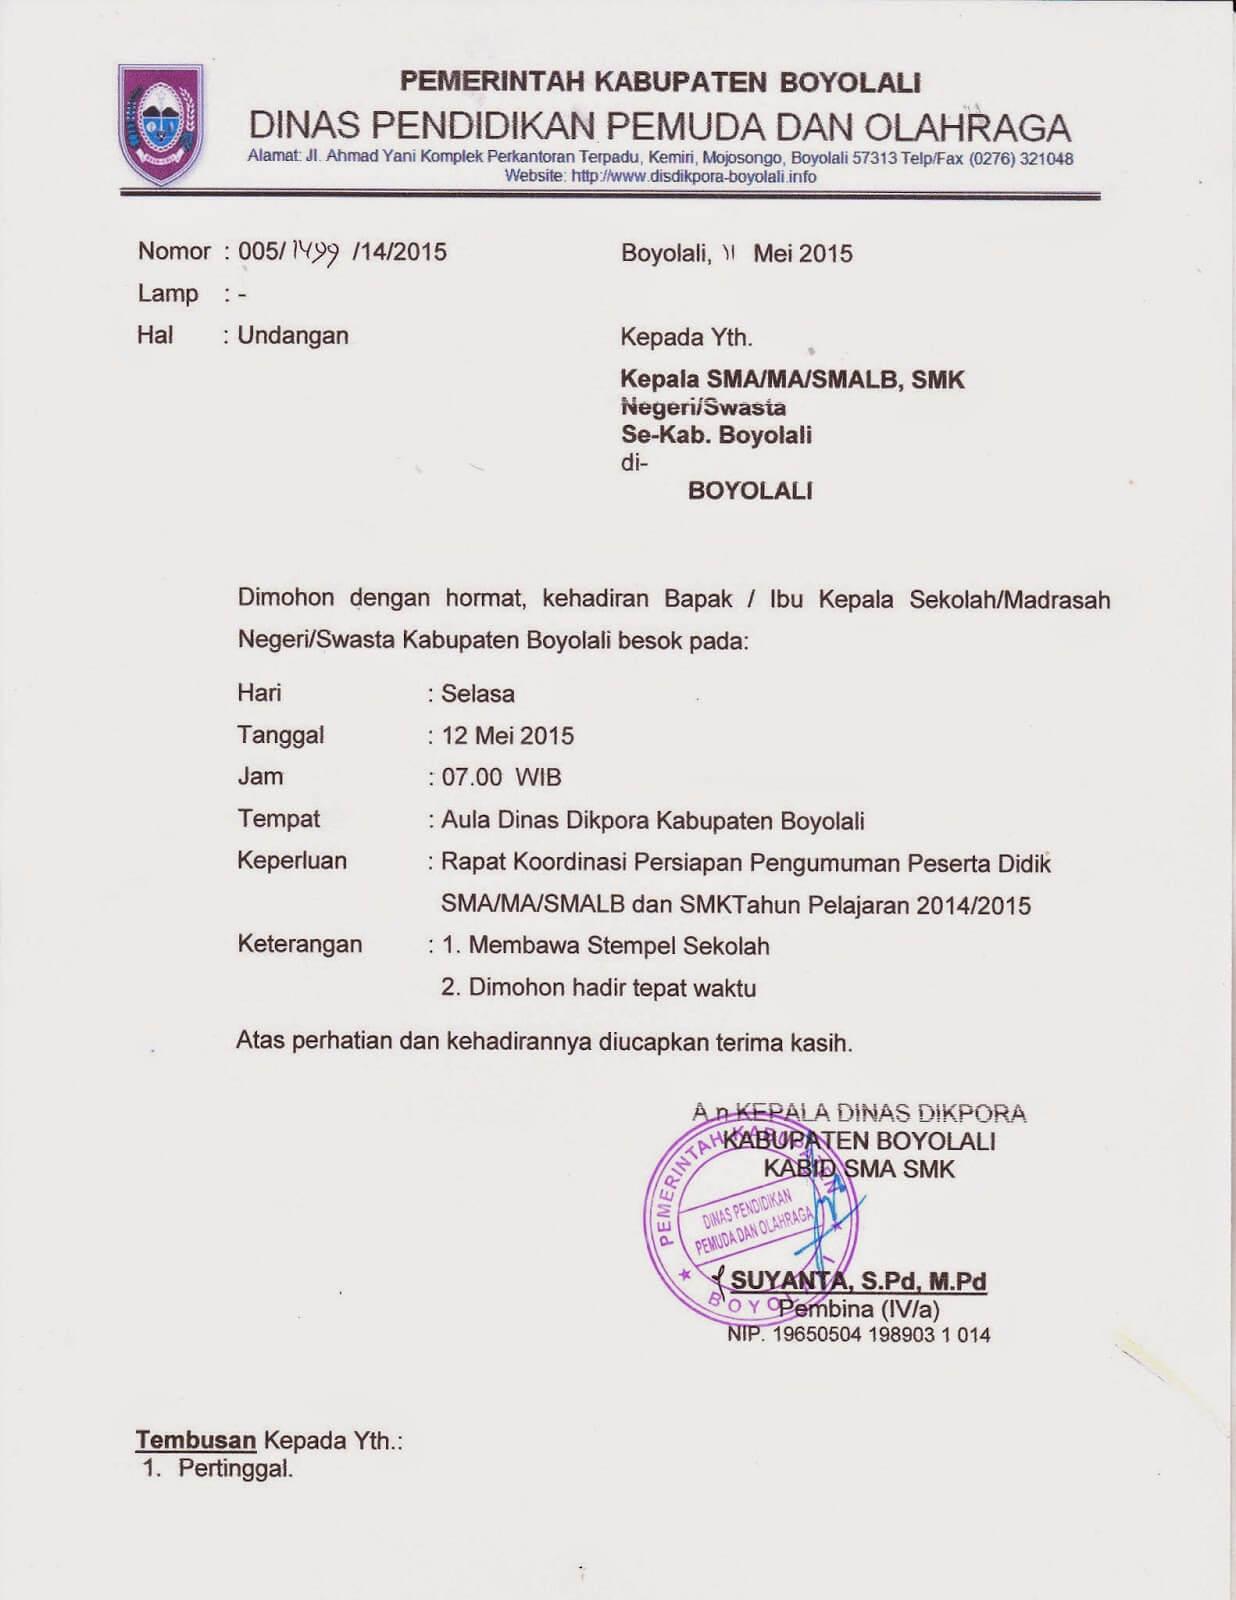 Contoh Surat Undangan Rapat Resmi Organisasi - Contoh Surat